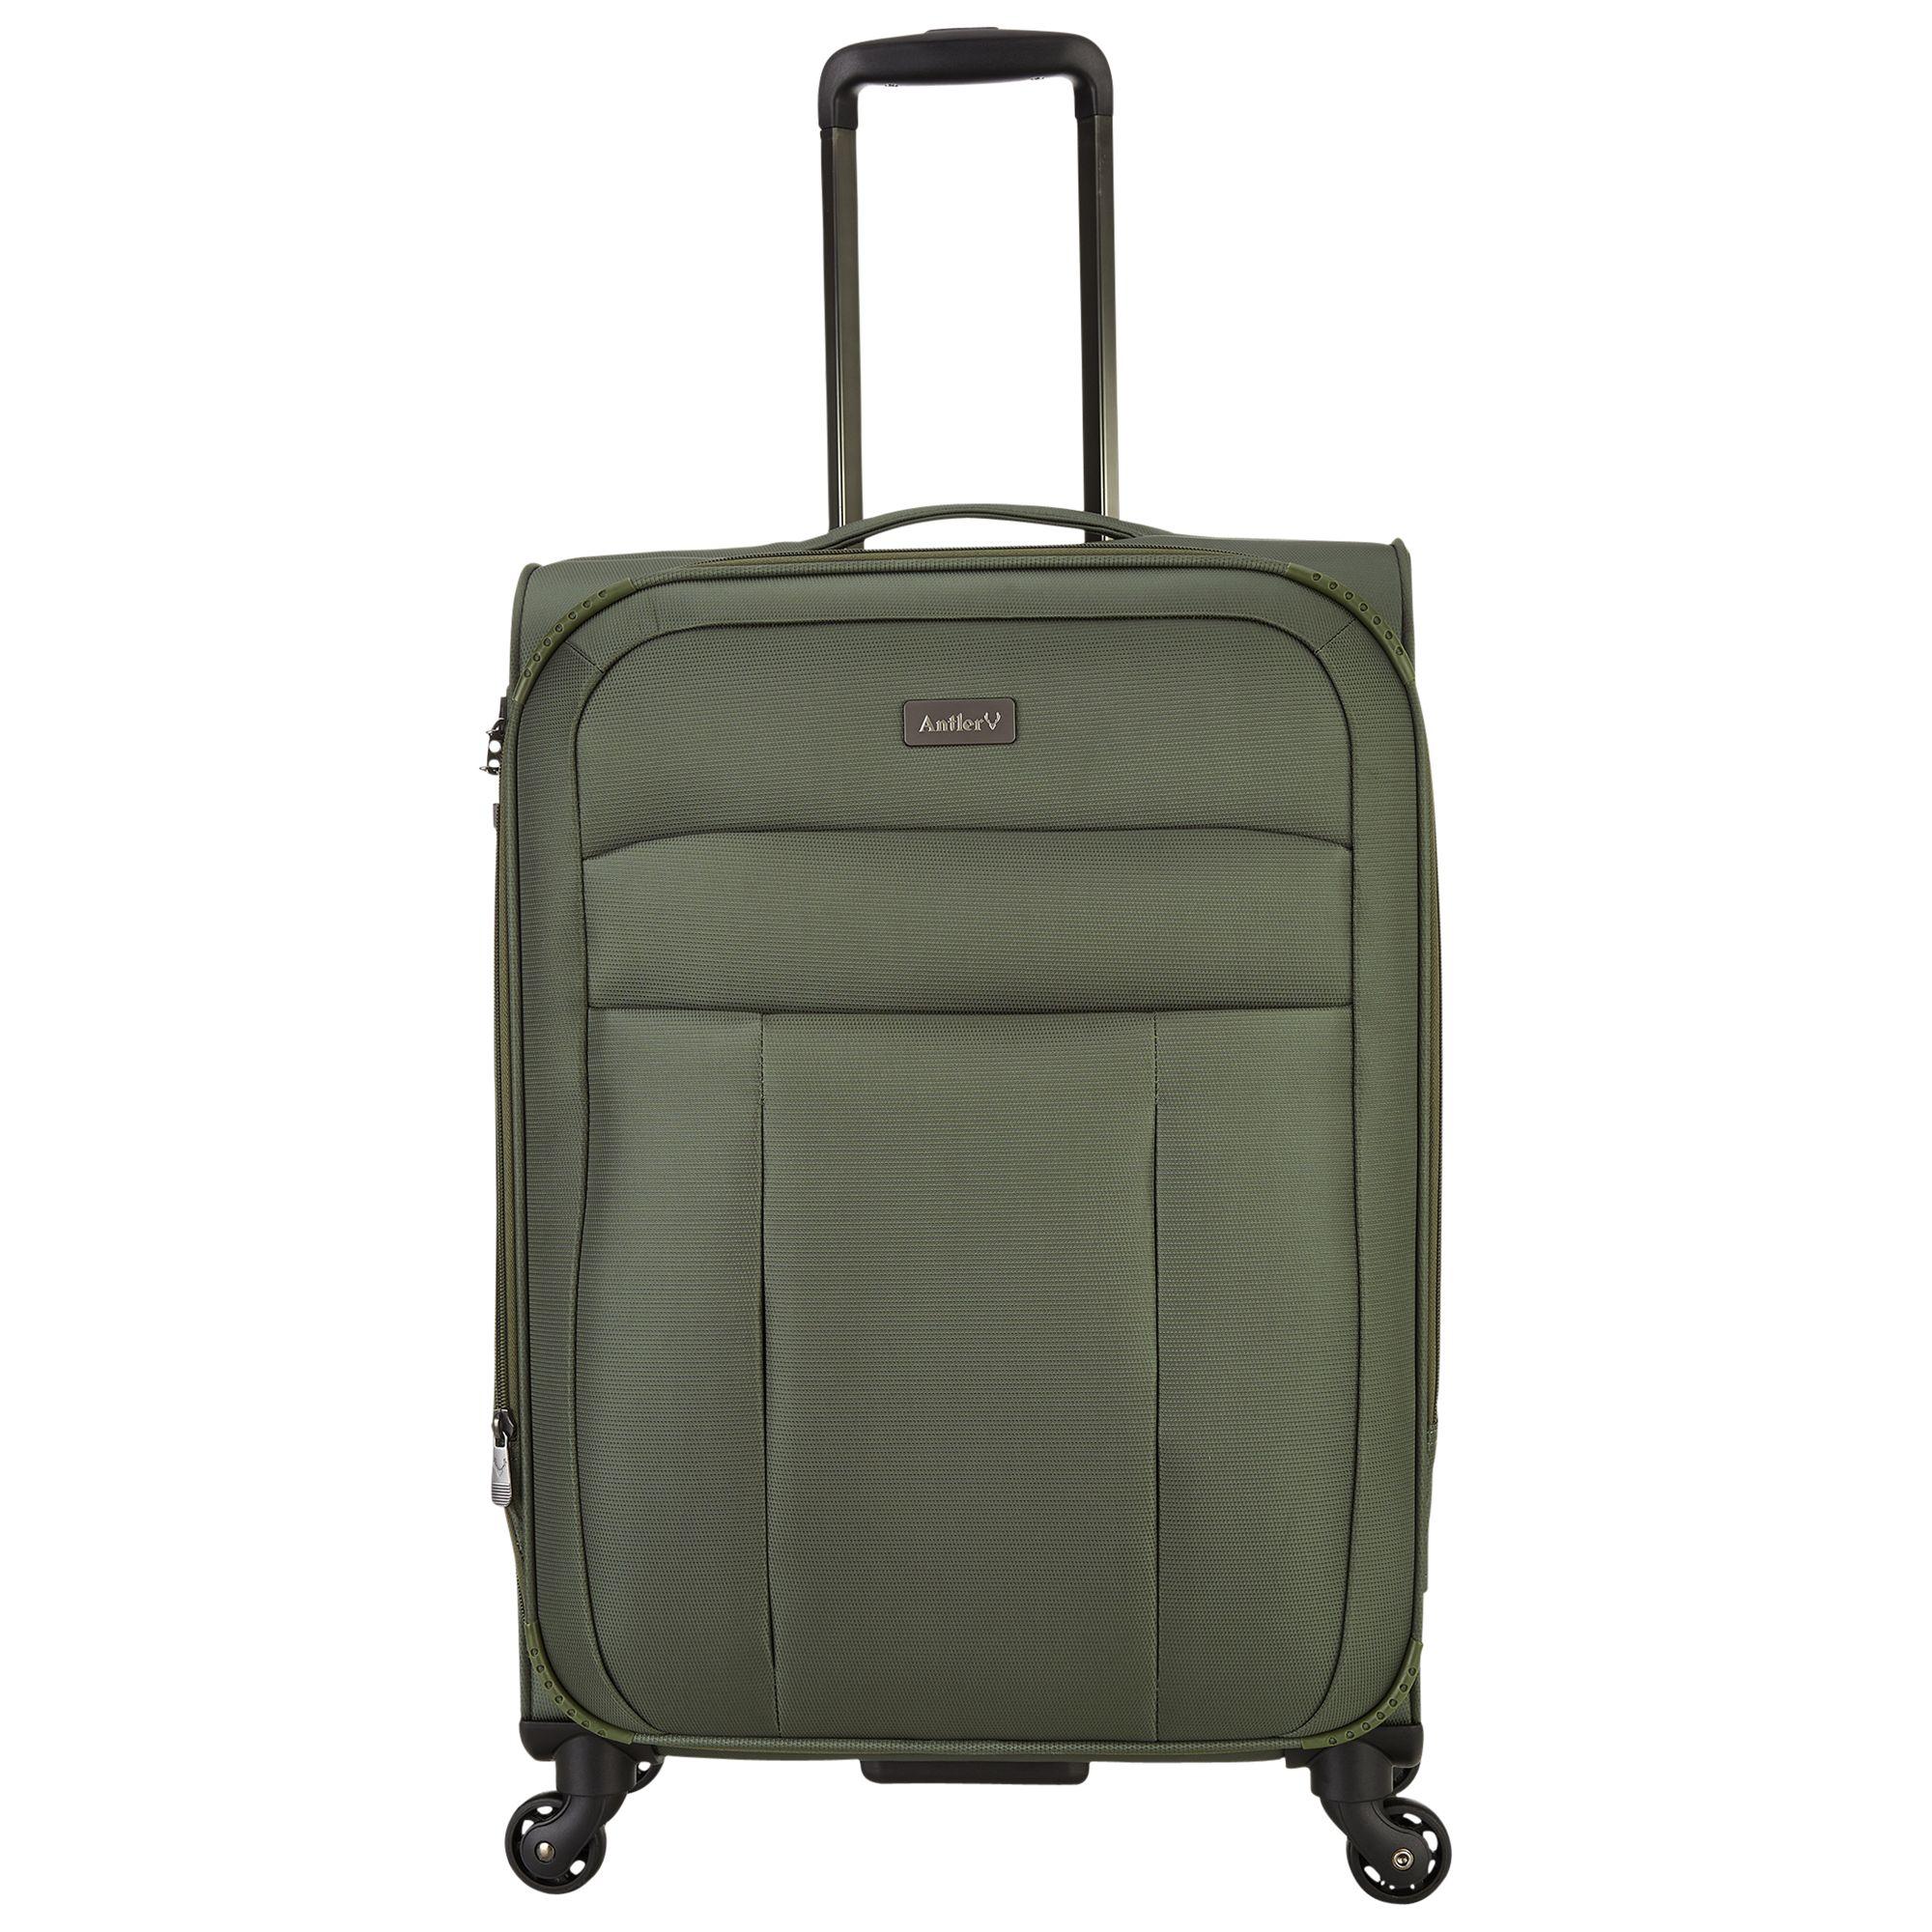 Antler Antler New Marcus 4-Wheel 66cm Suitcase